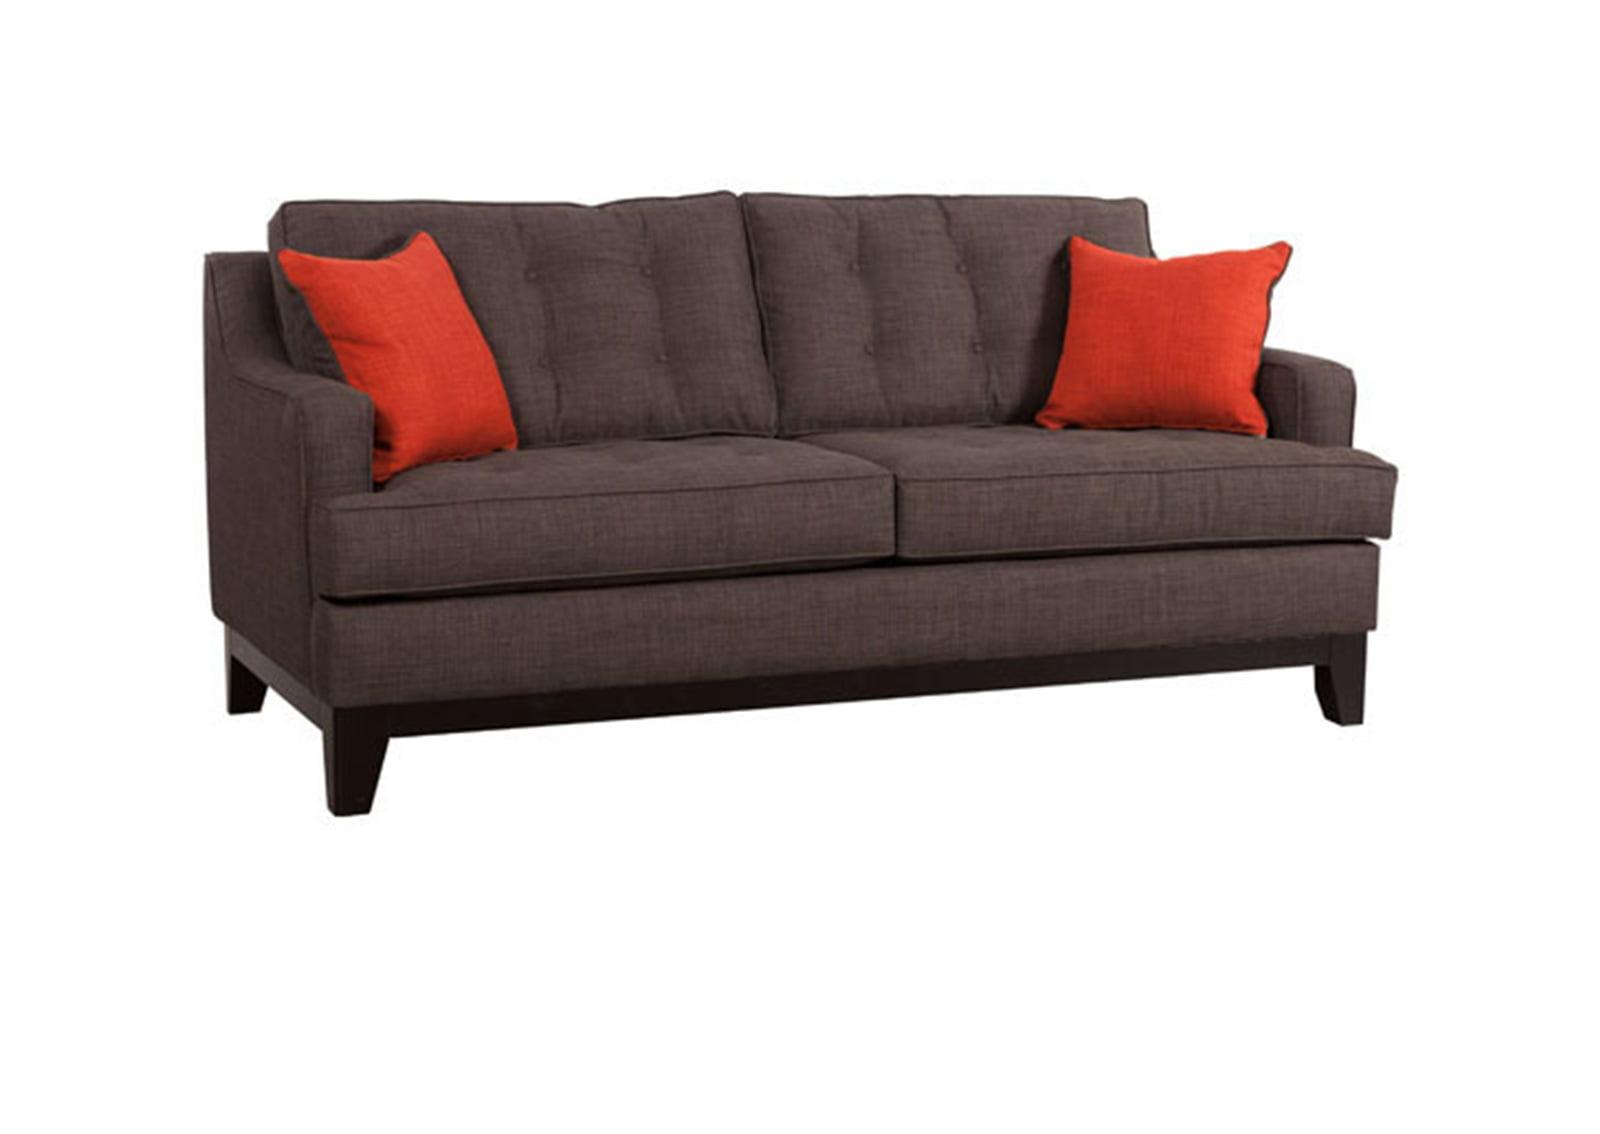 Chicago Sofa Charcoalburnt Orange FurnishPlus : Chicago Sofa Charcoalburnt Orange1 from furnishplus.ca size 1600 x 1134 jpeg 122kB